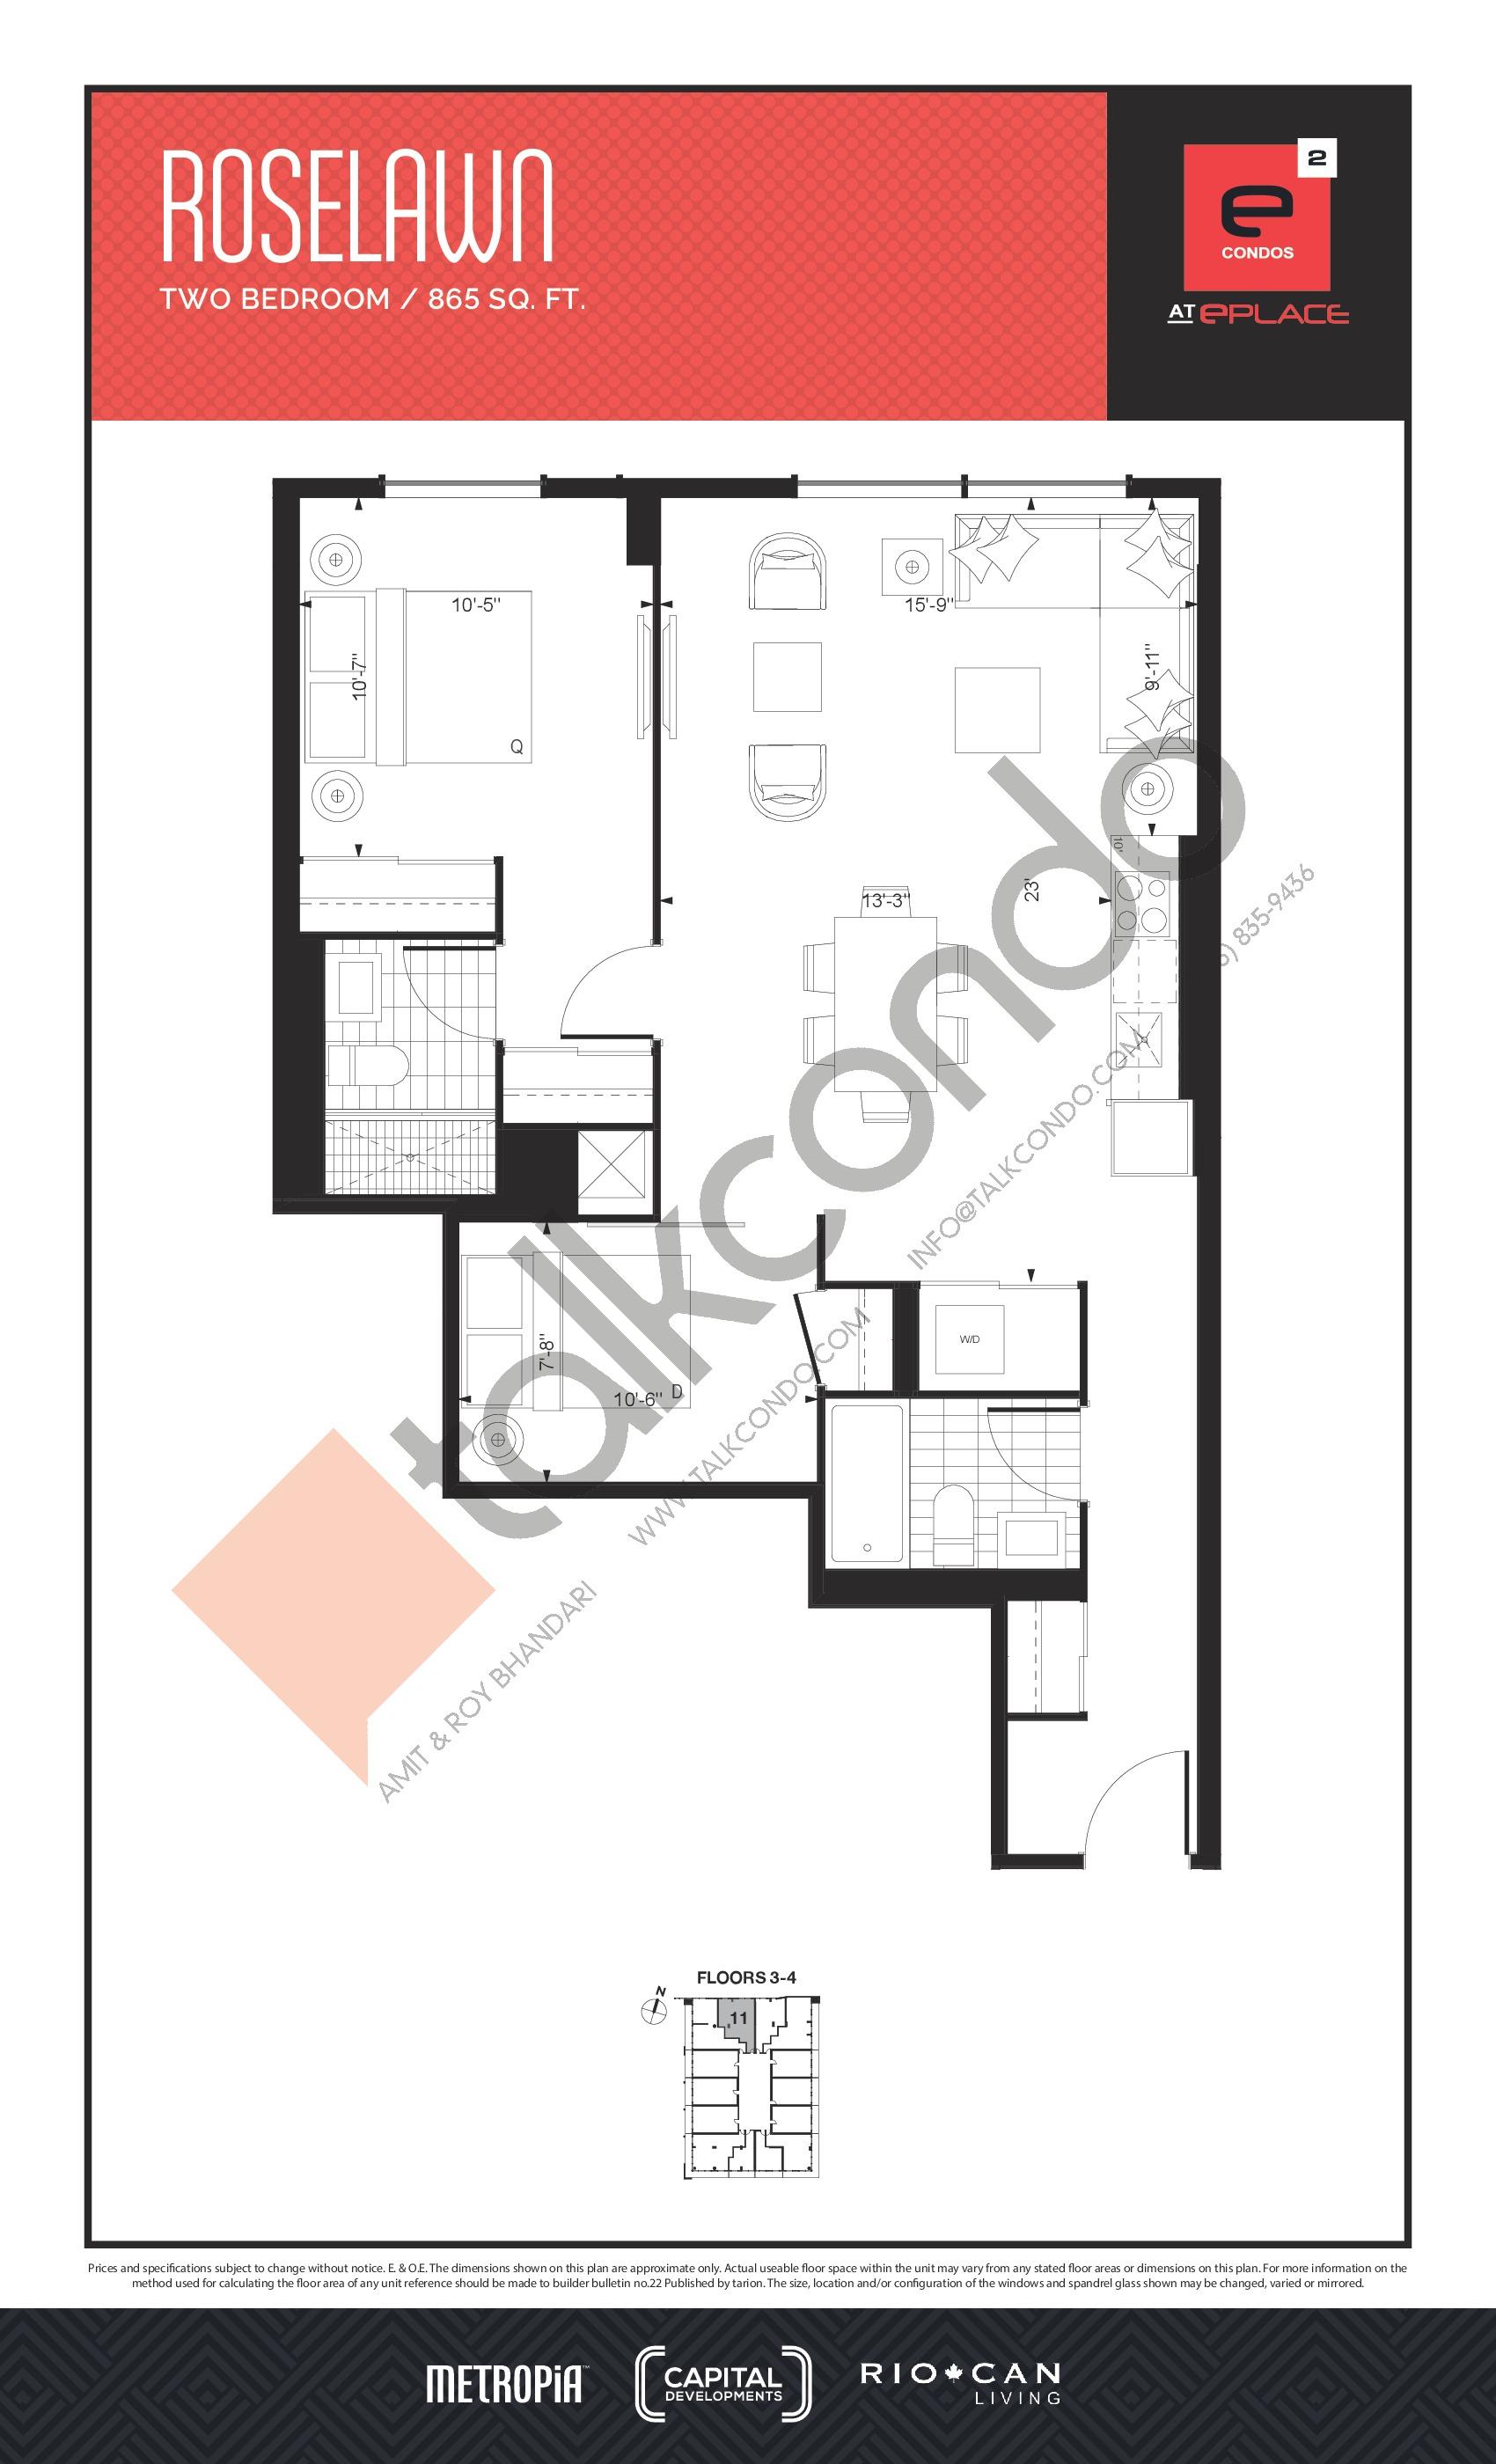 Roselawn Floor Plan at E2 Condos - 865 sq.ft